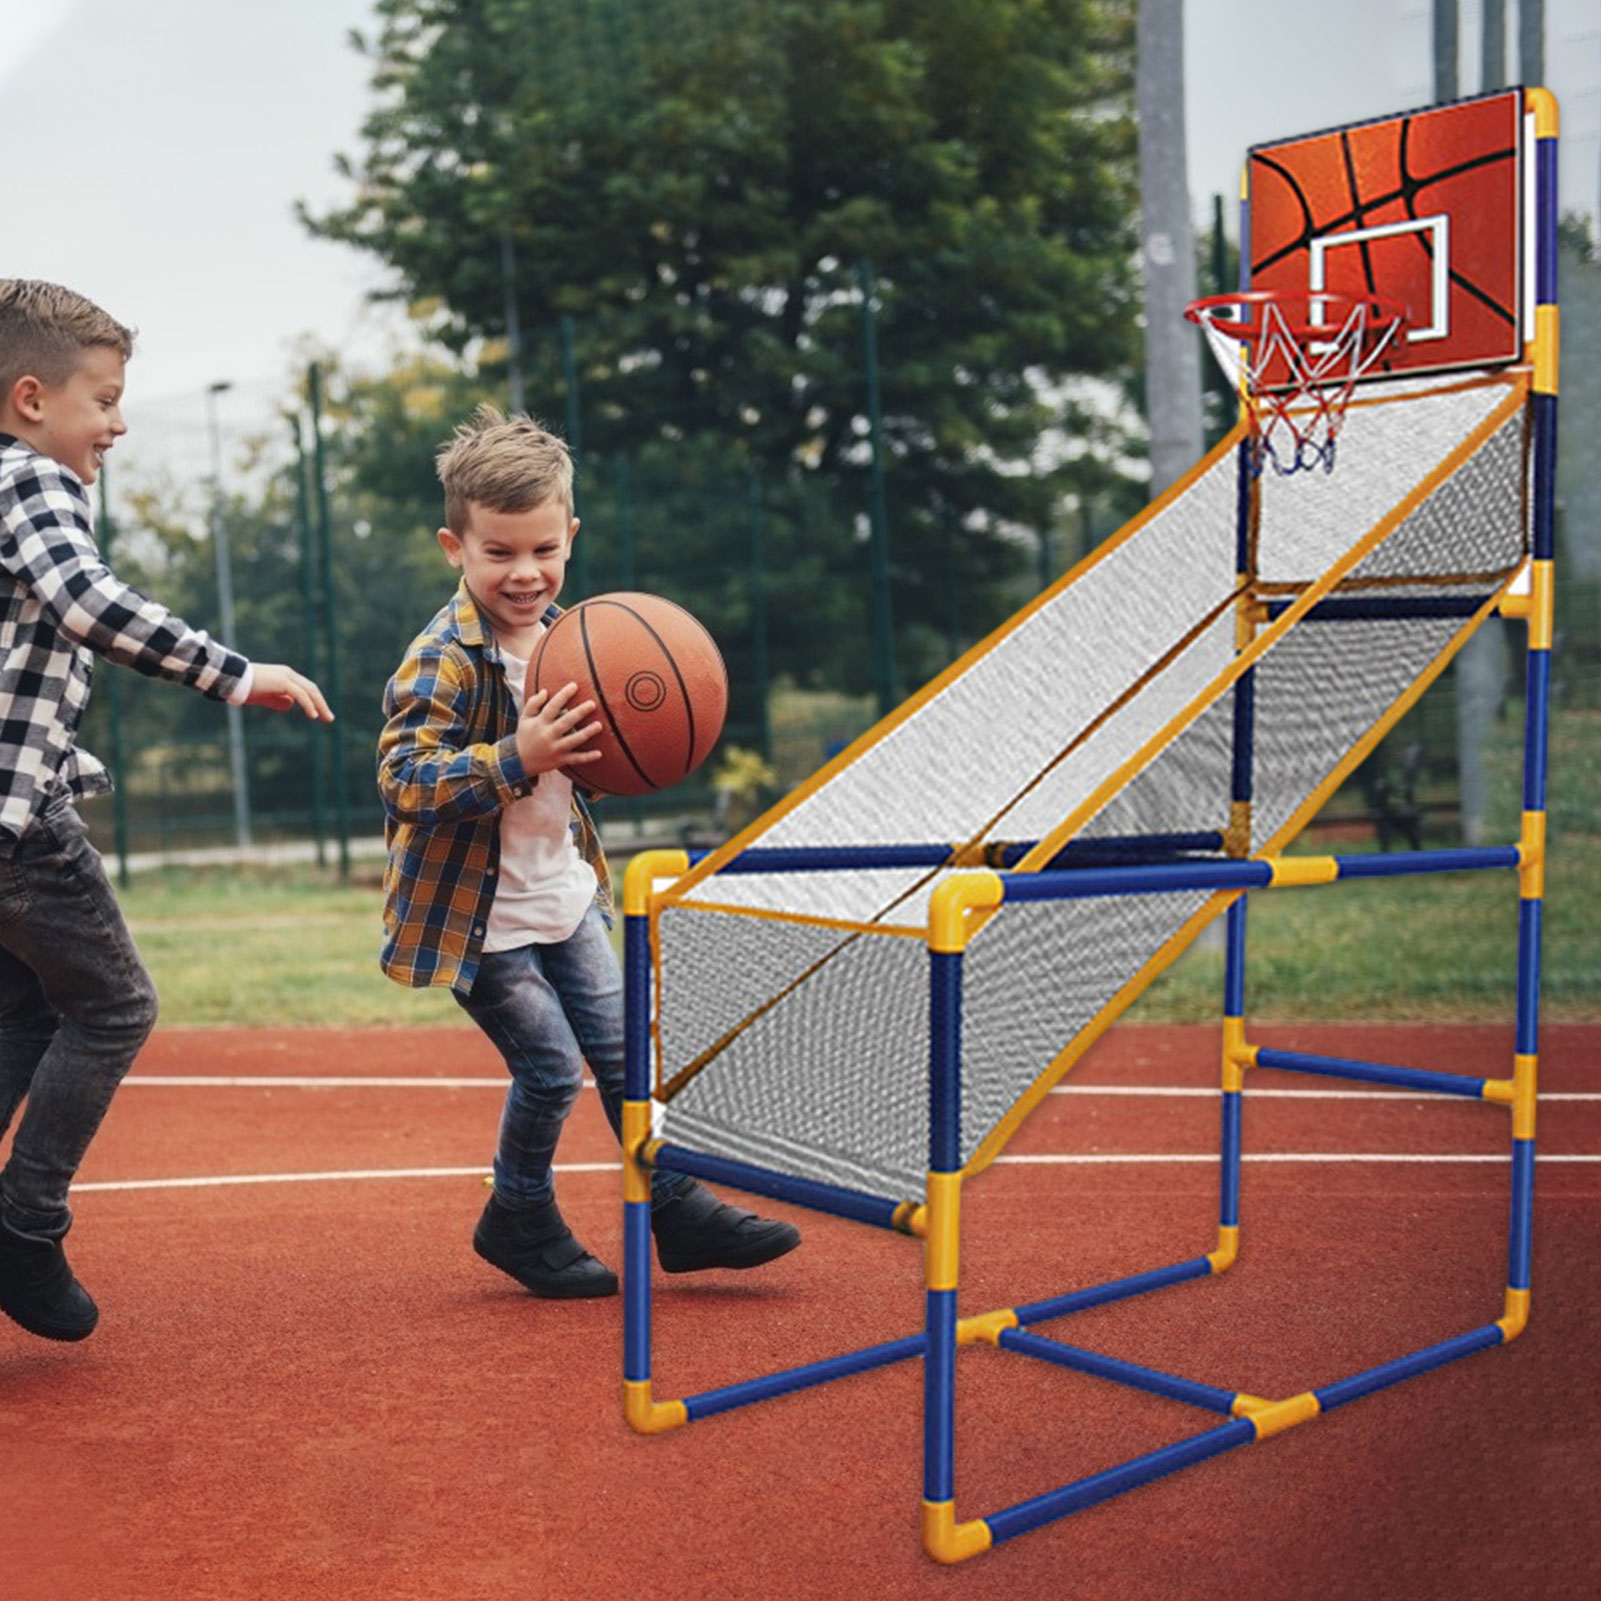 2021 children's inflatable basketball hoop kids arcade basketball hoop game outdoor basketball machine arcade set children's toy